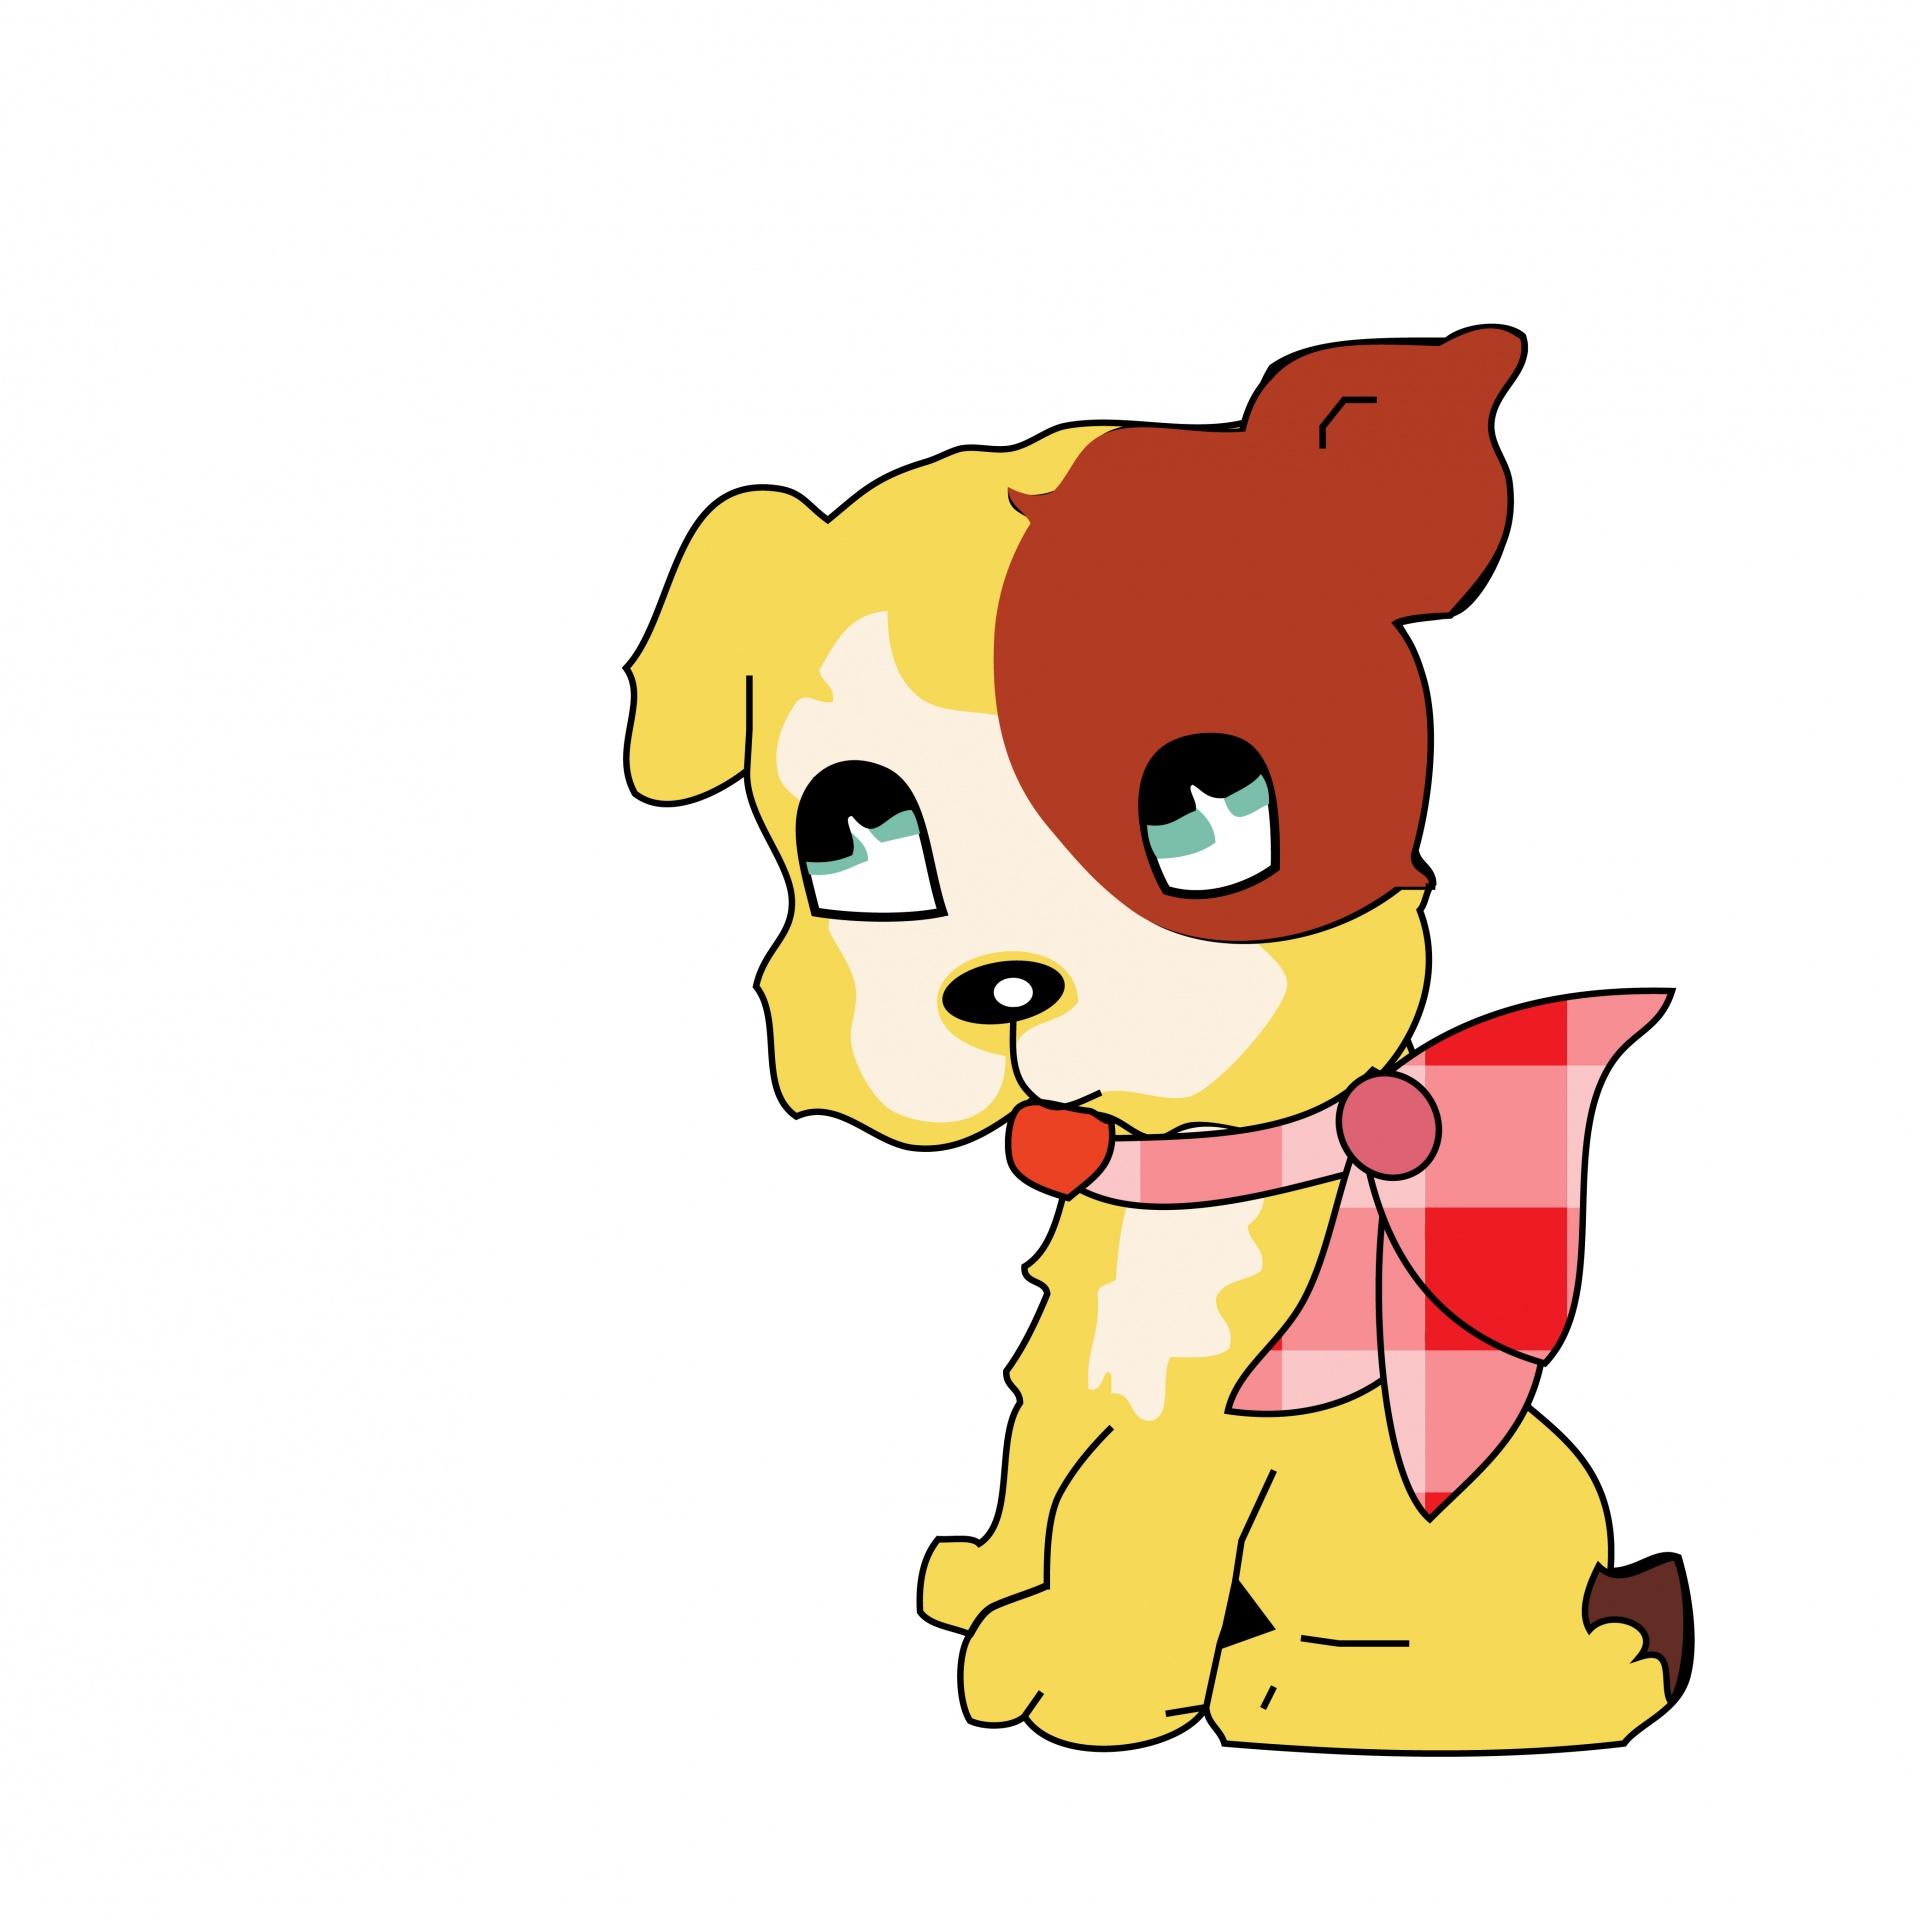 1920x1920 Cute Dog Clipart Free Stock Photo